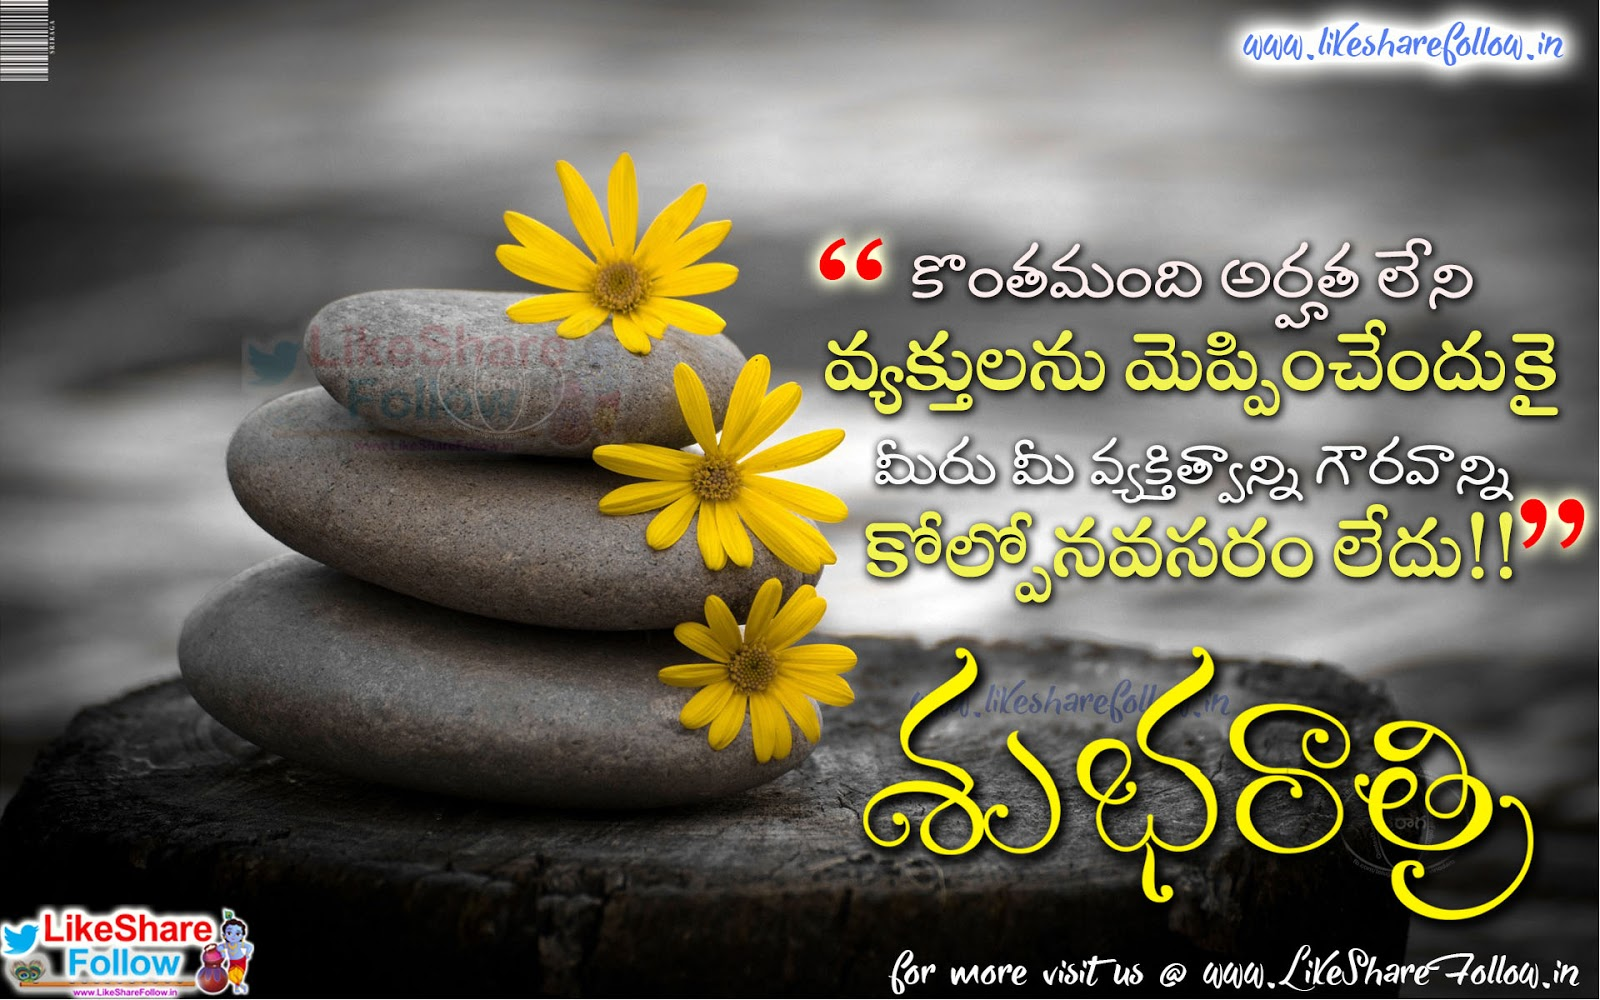 Good night Quotes in Telugu_1 | Like Share Follow